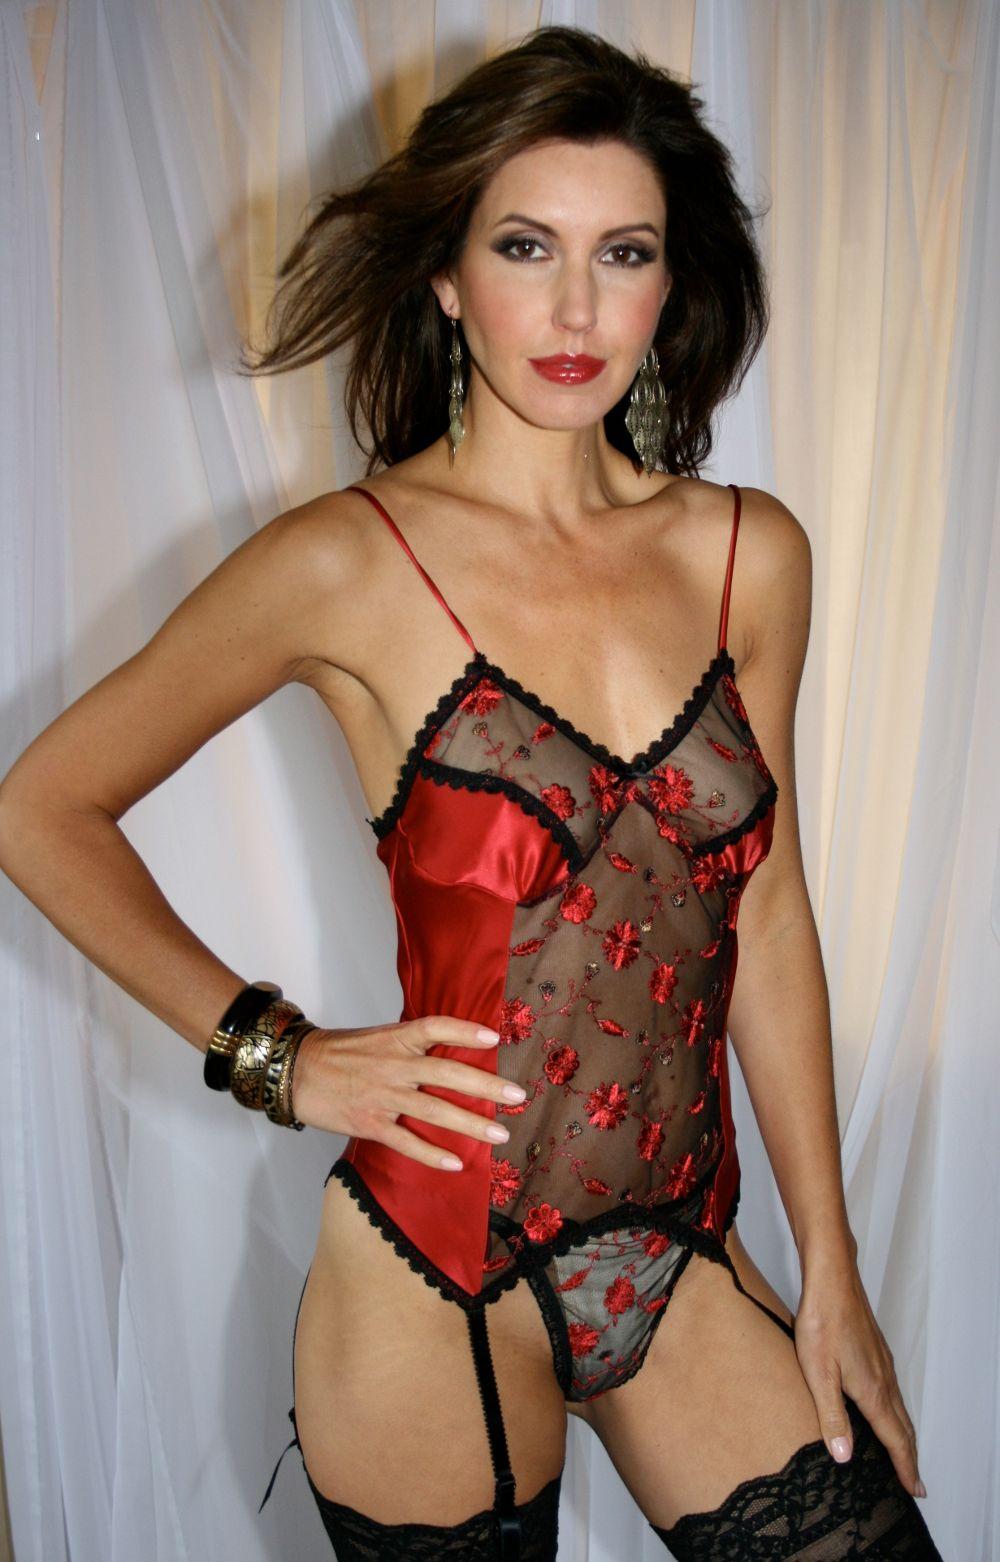 9262eb511b Red Silk  amp  Black Lace Soft Basque Set - Carmen by Diki Lingerie  Designer Lingerie